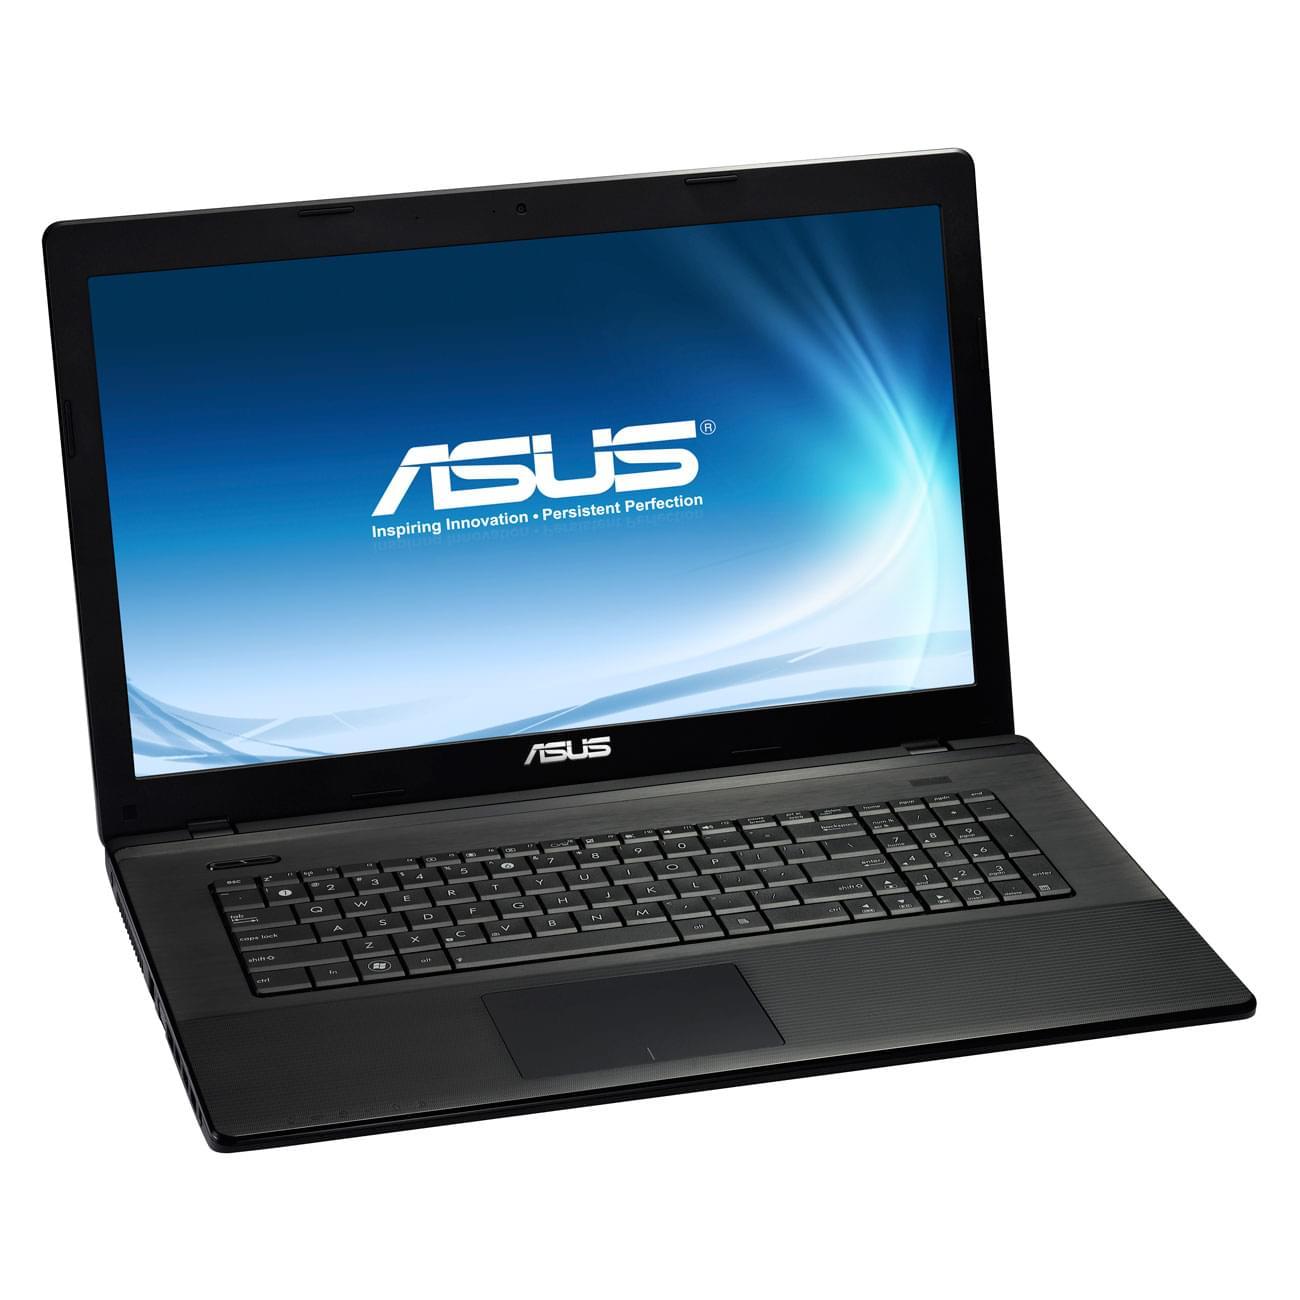 Asus X75VD-TY181H - PC portable Asus - Cybertek.fr - 0